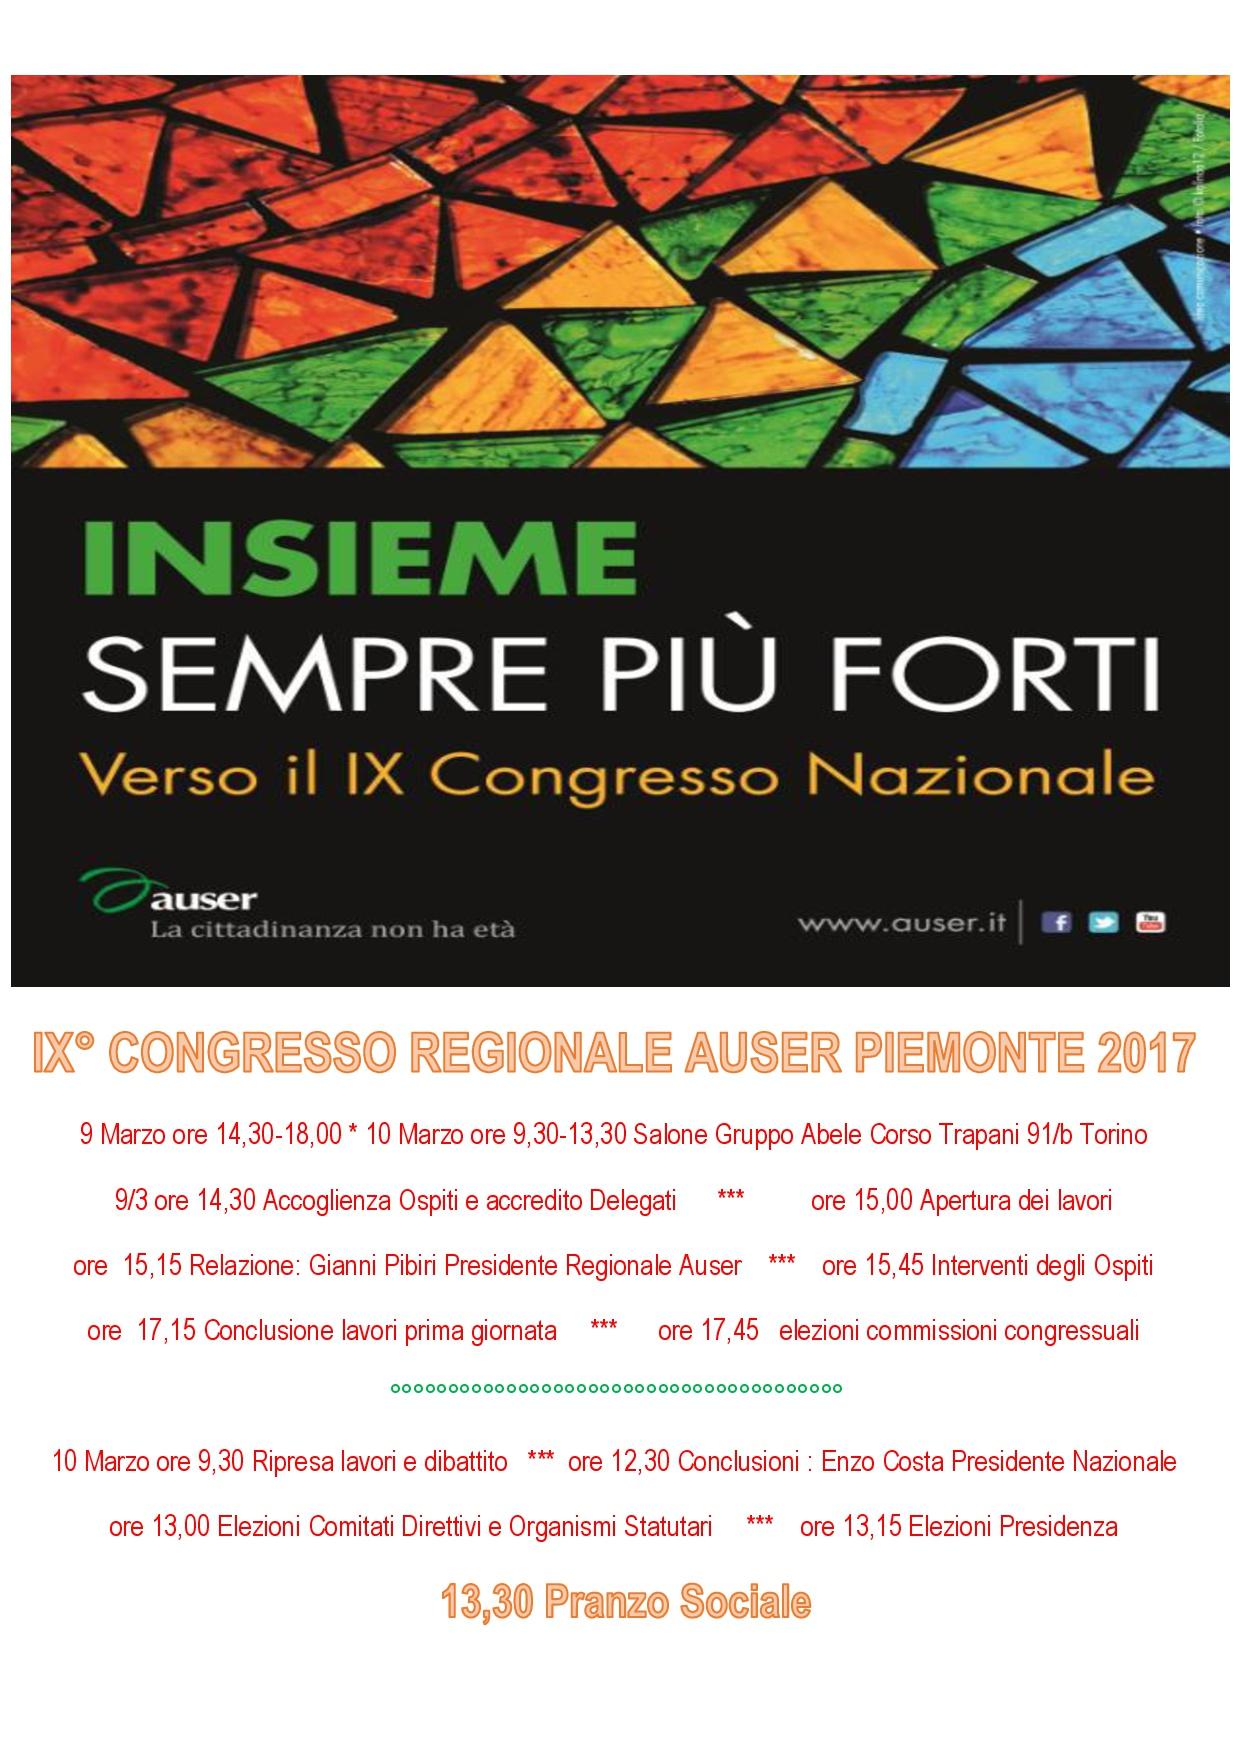 IX CONGRESSO REGIONALE AUSER PIEMONTE